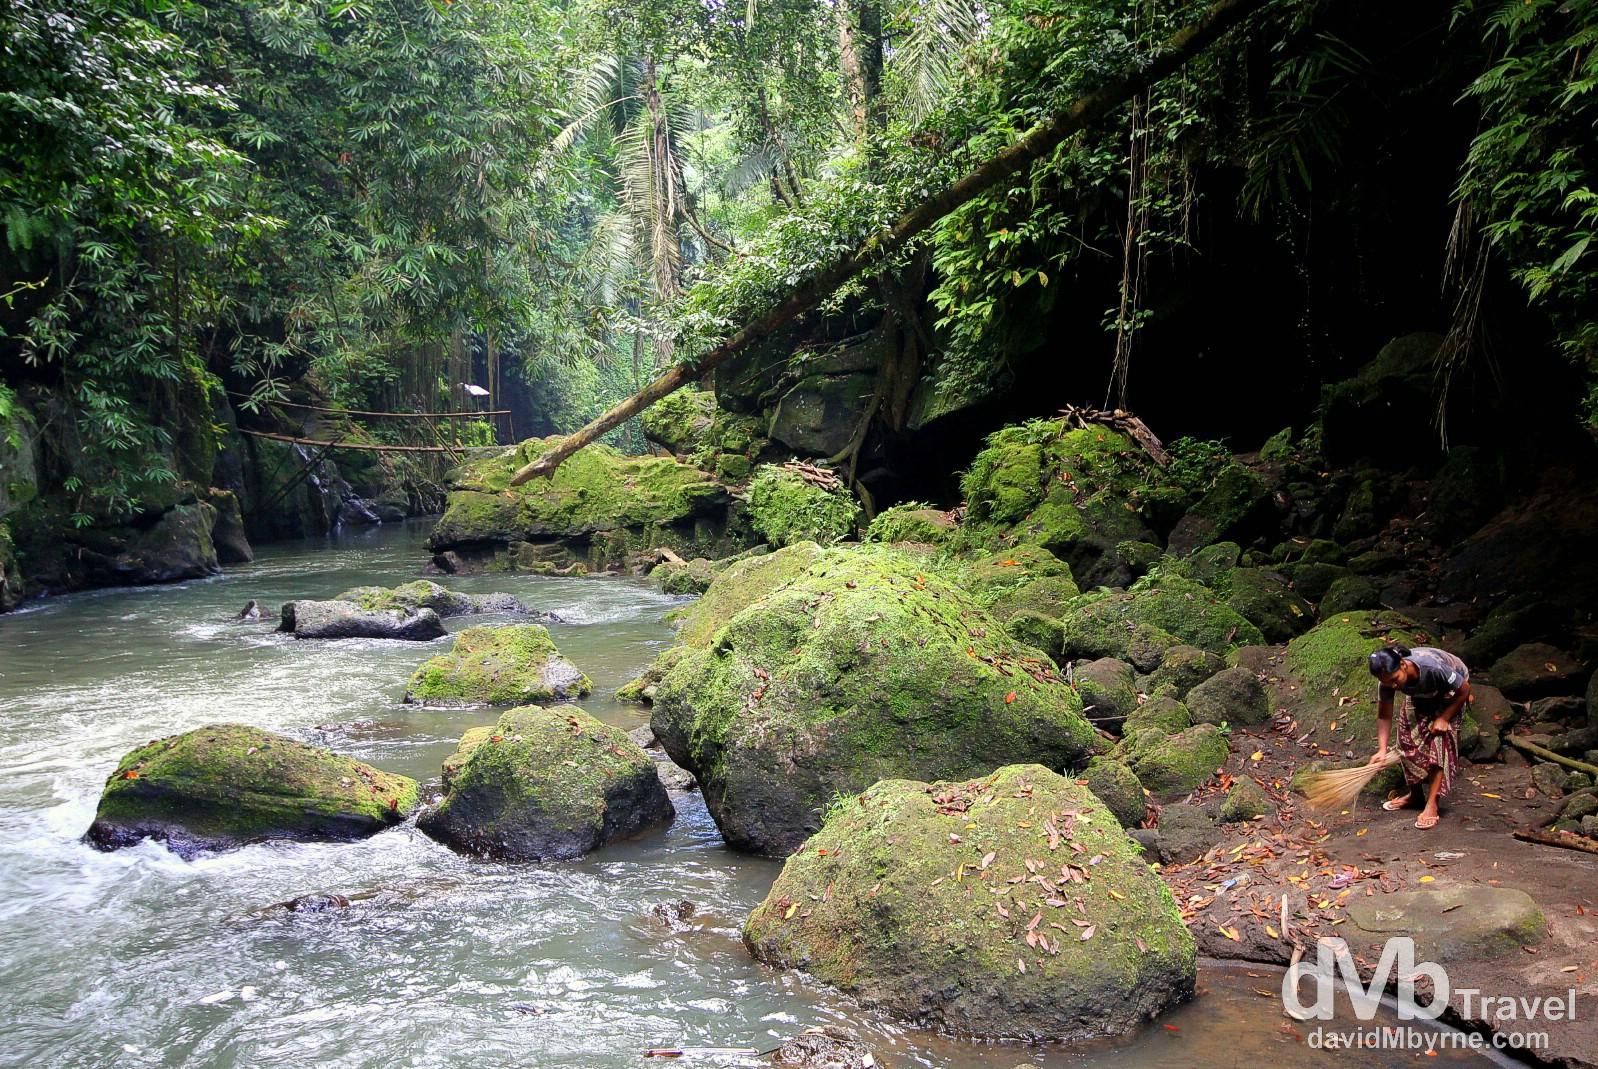 New Latest Quotes Wallpaper Jungle Scenery Near Goa Gajah Elephant Cave On The